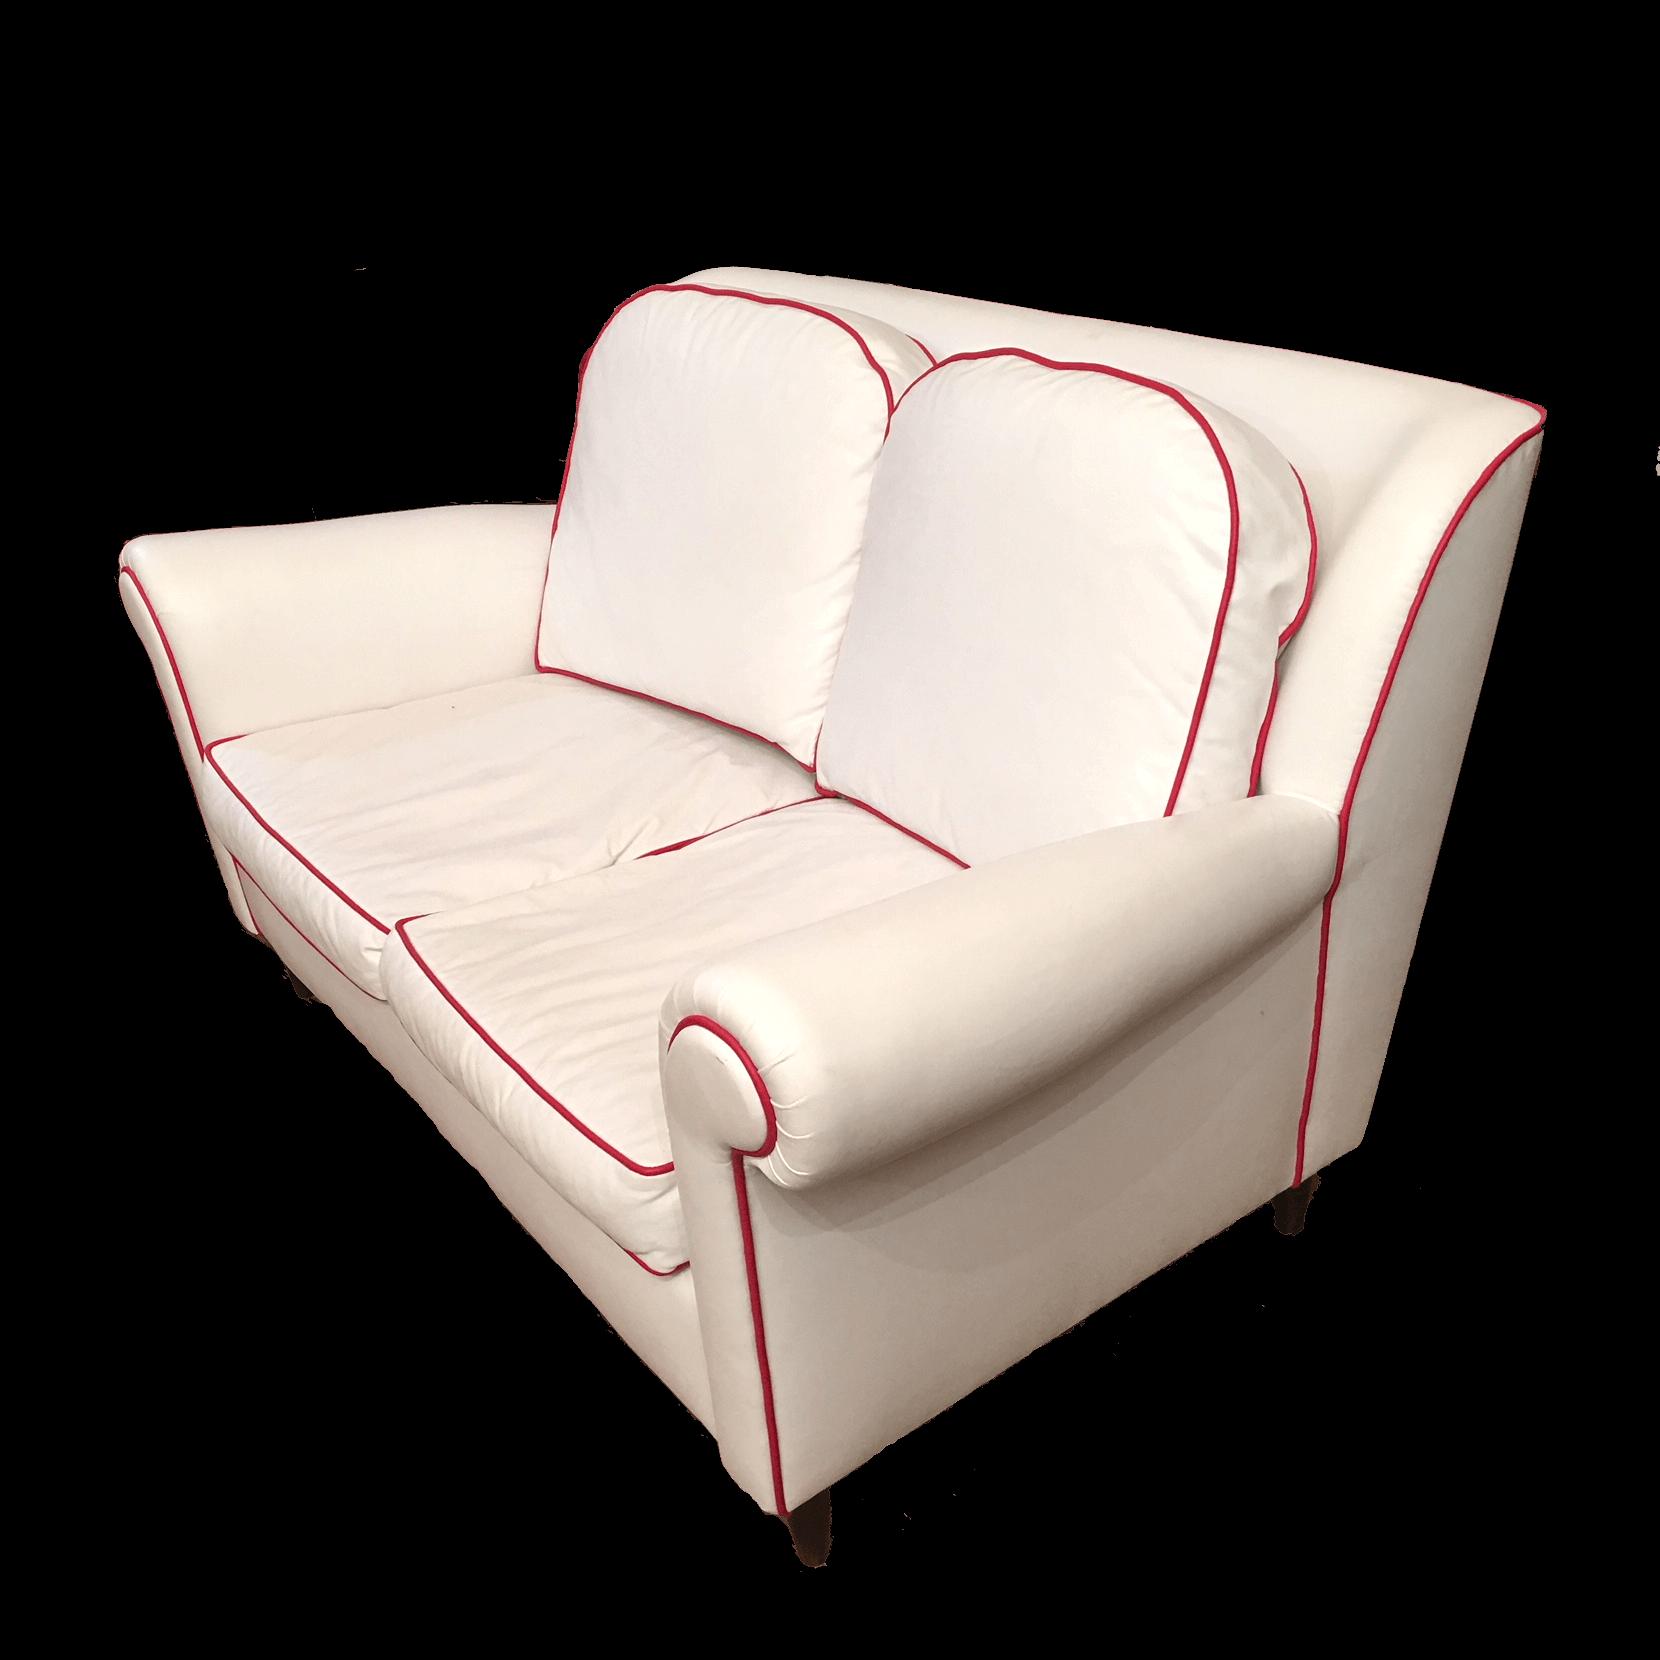 Divano in eco pelle bianco divani vintage bogys50s for Divano pelle bianco